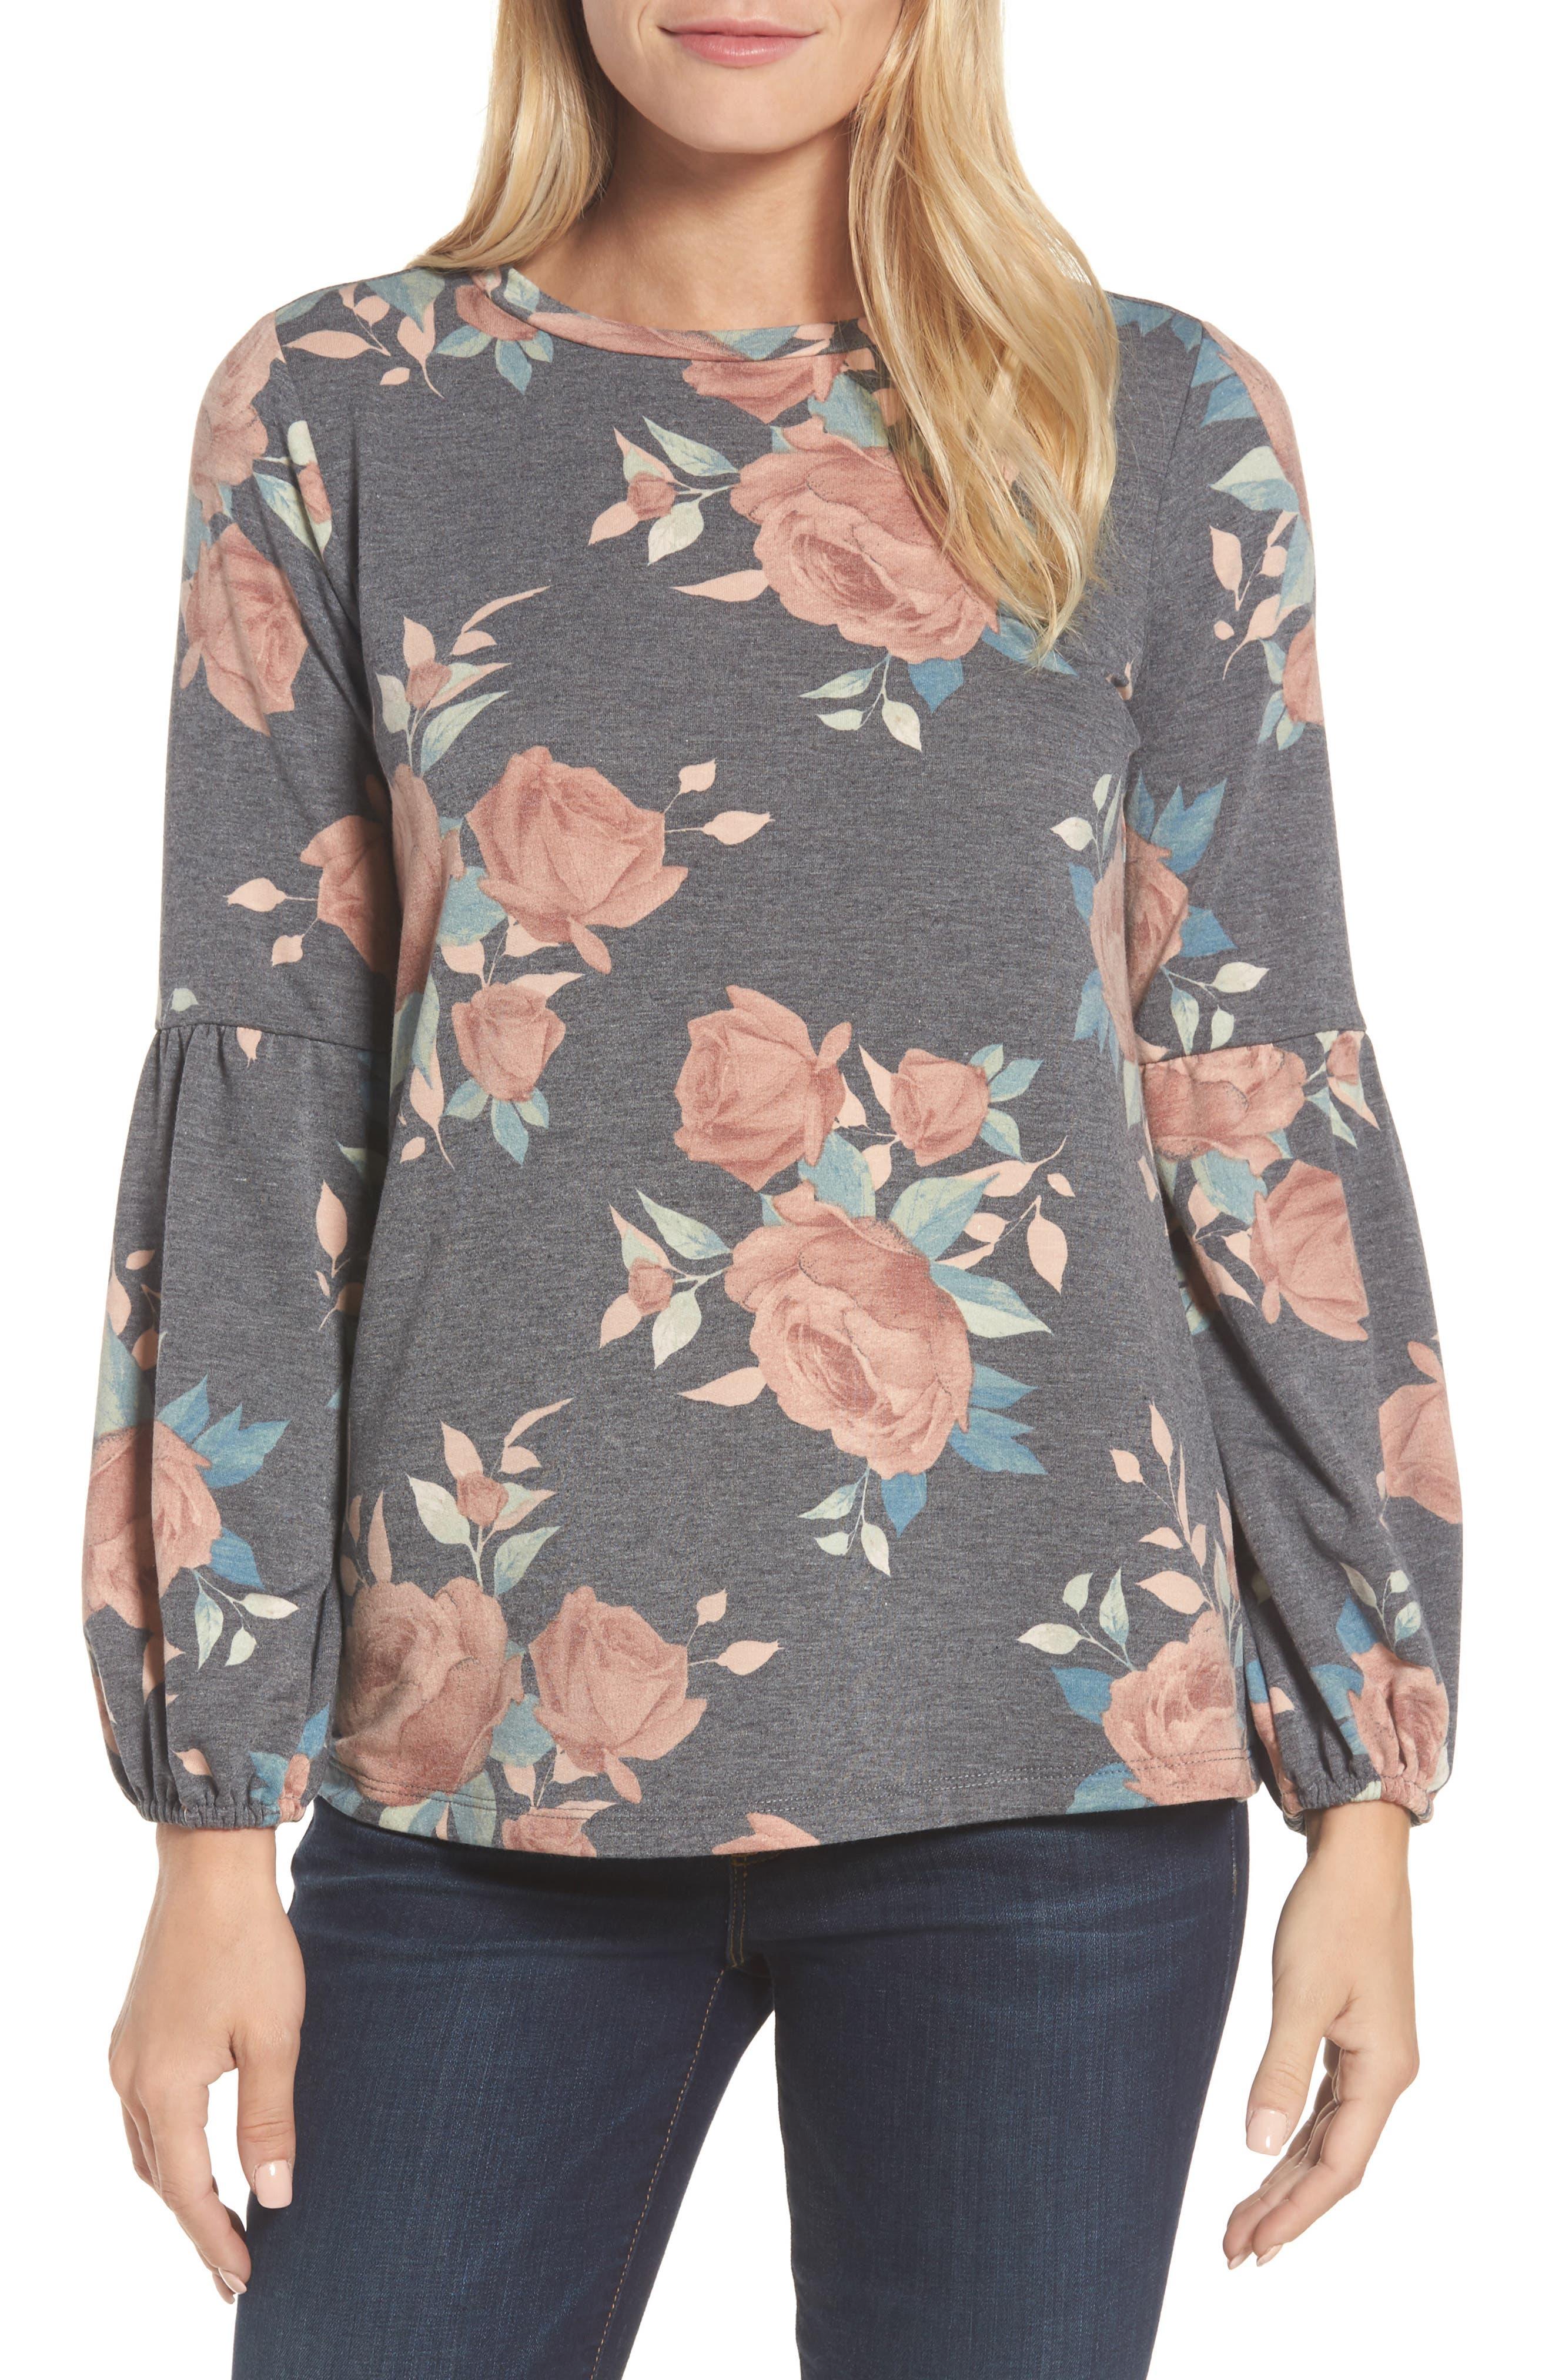 Alternate Image 1 Selected - Bobeau Floral Print Balloon Sleeve Sweatshirt (Regular & Petite)